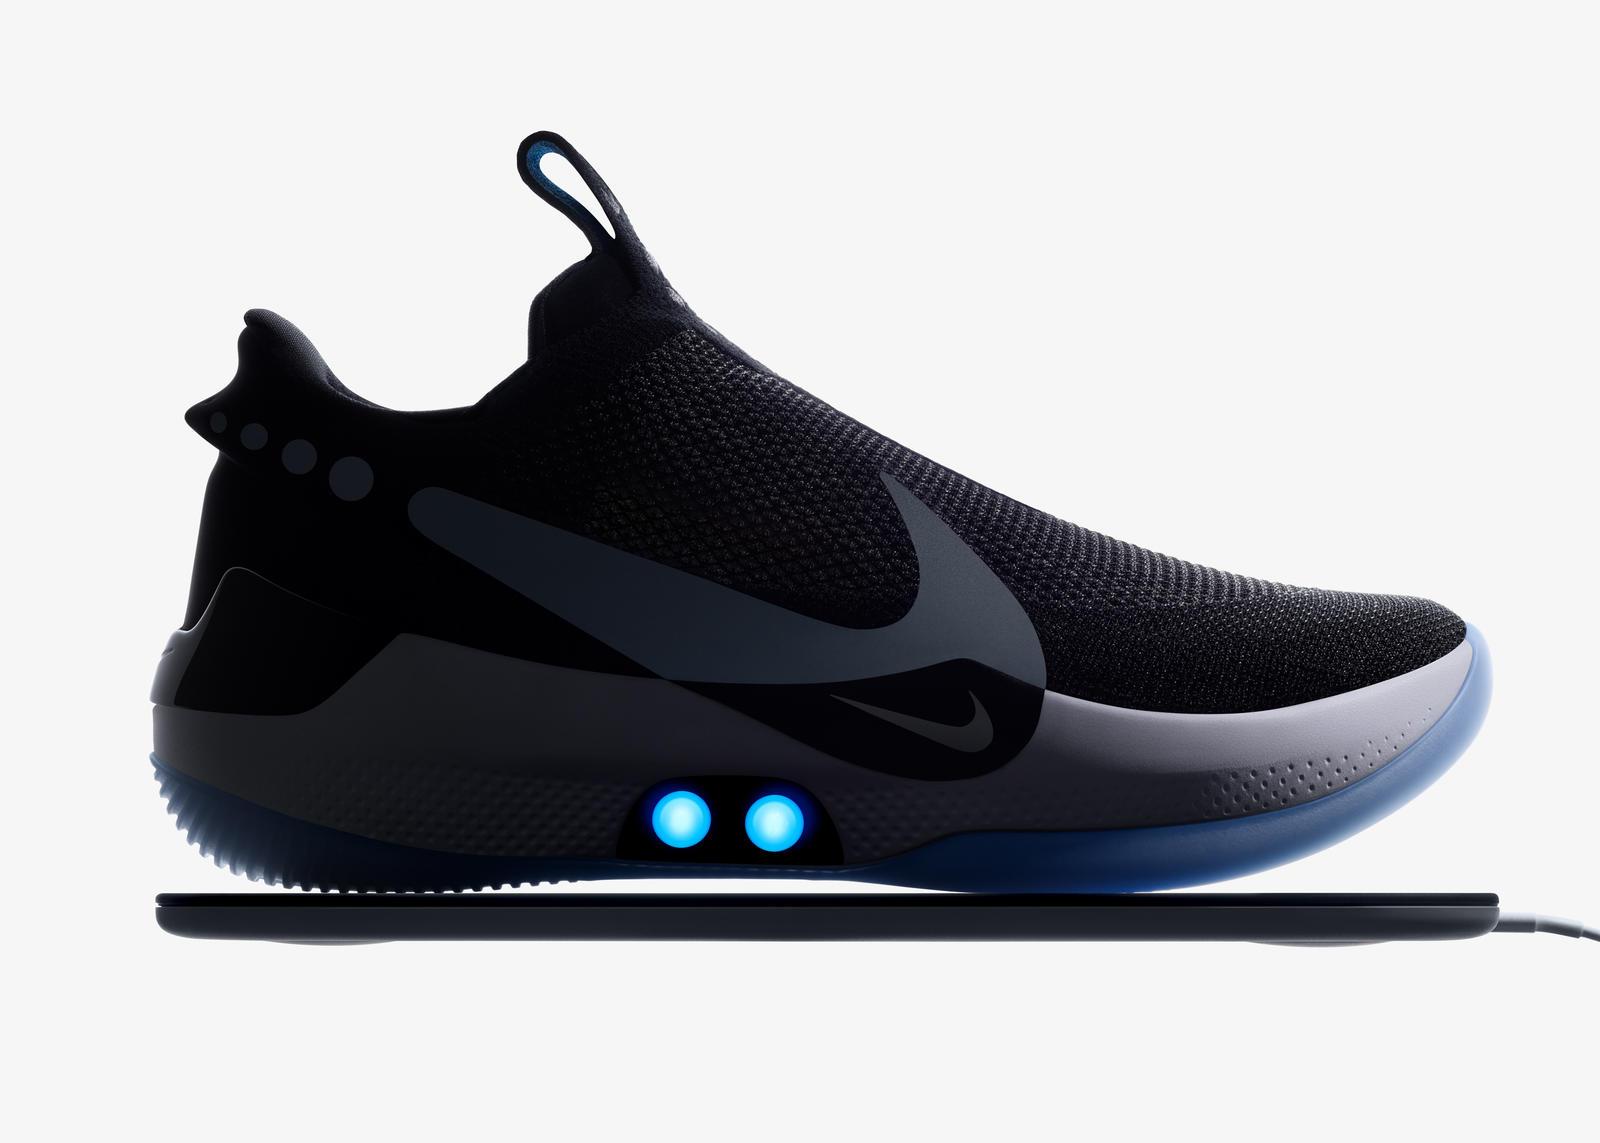 Sp19_BB_Nike_Adapt_20181218_NIKE0538_Detail5_rectangle_1600_1547637483033.jpg